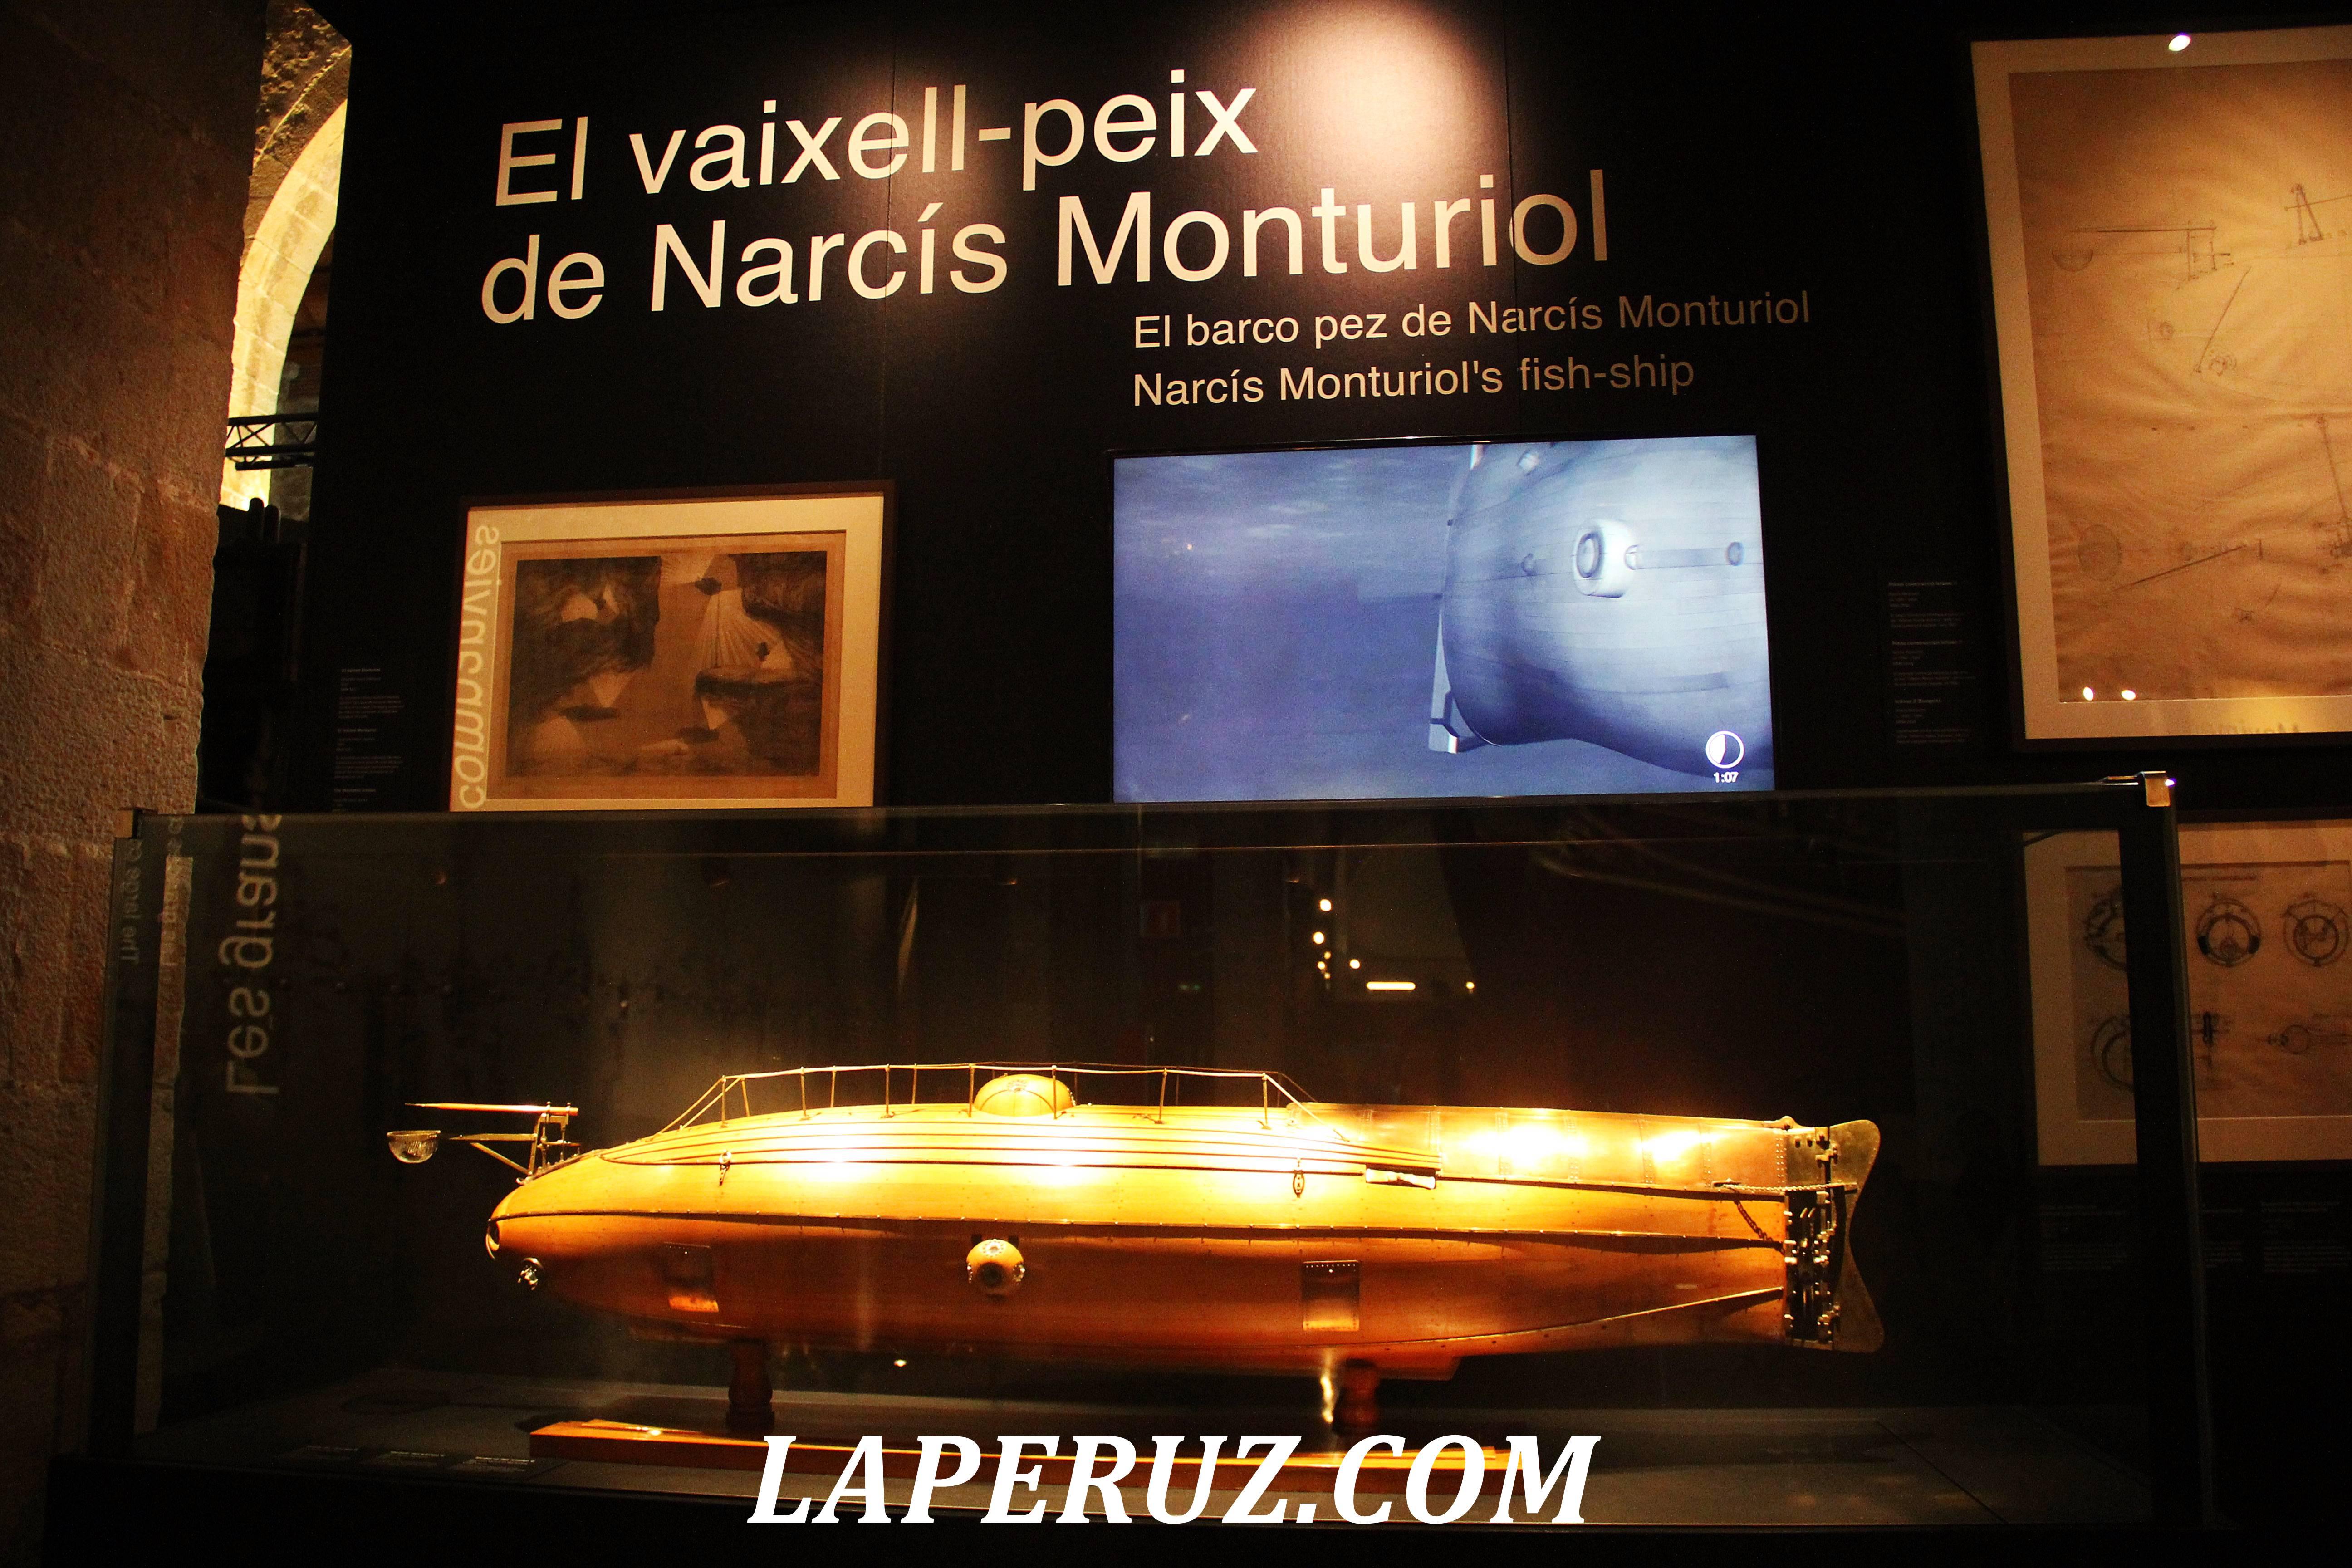 morskoi_muzei_barcelona_monturiol_2